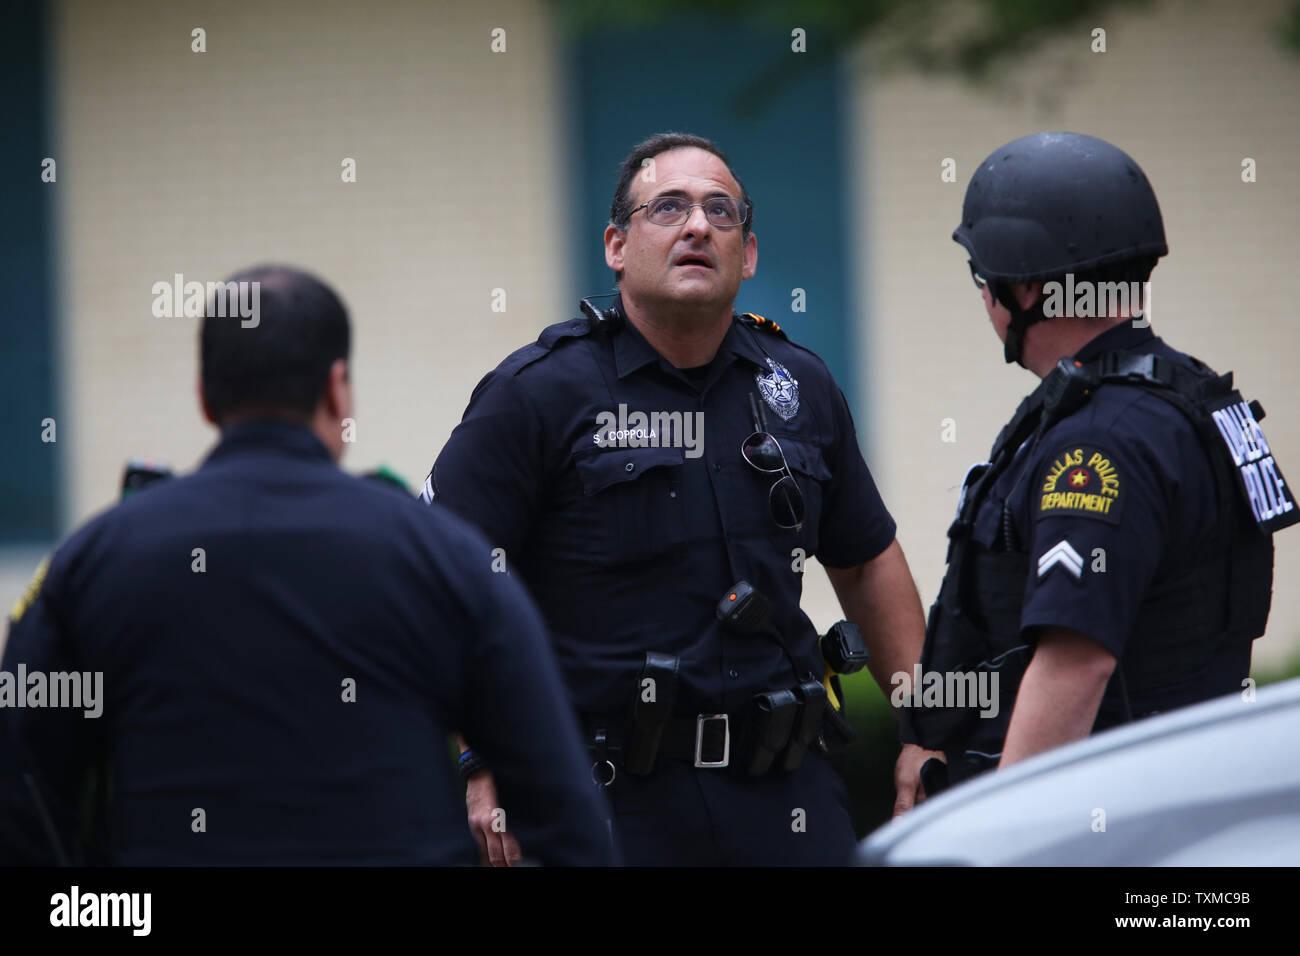 Dallas Police Headquarters Stock Photos & Dallas Police